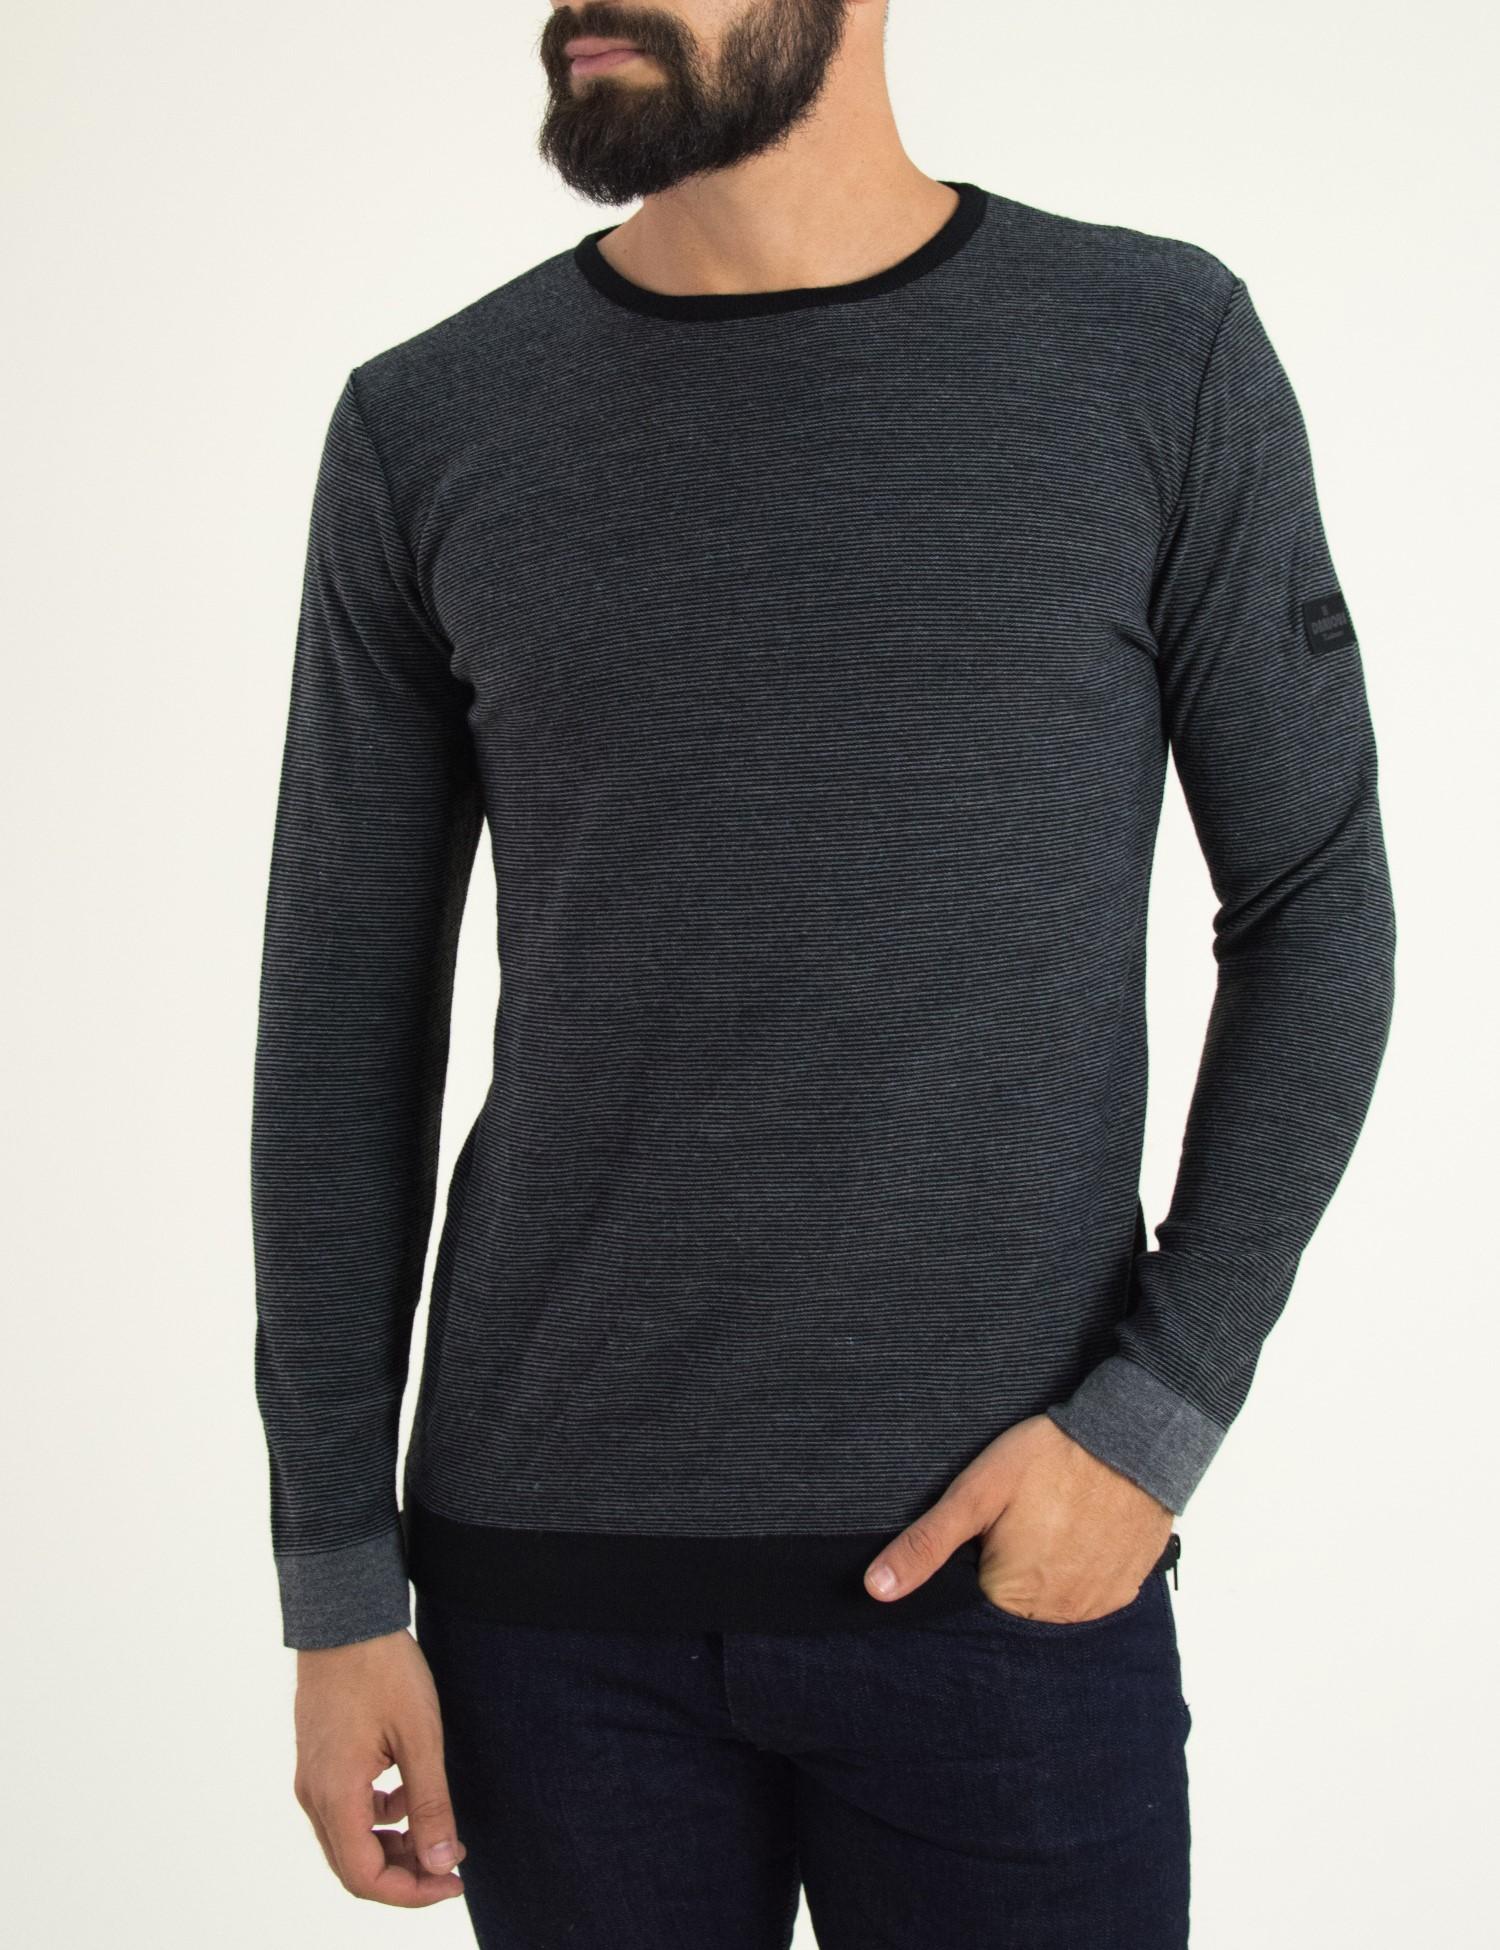 c8779f3d58be Ανδρική μακρυμάνικη πλεκτή μπλούζα Darious μαύρη ριγέ 1744